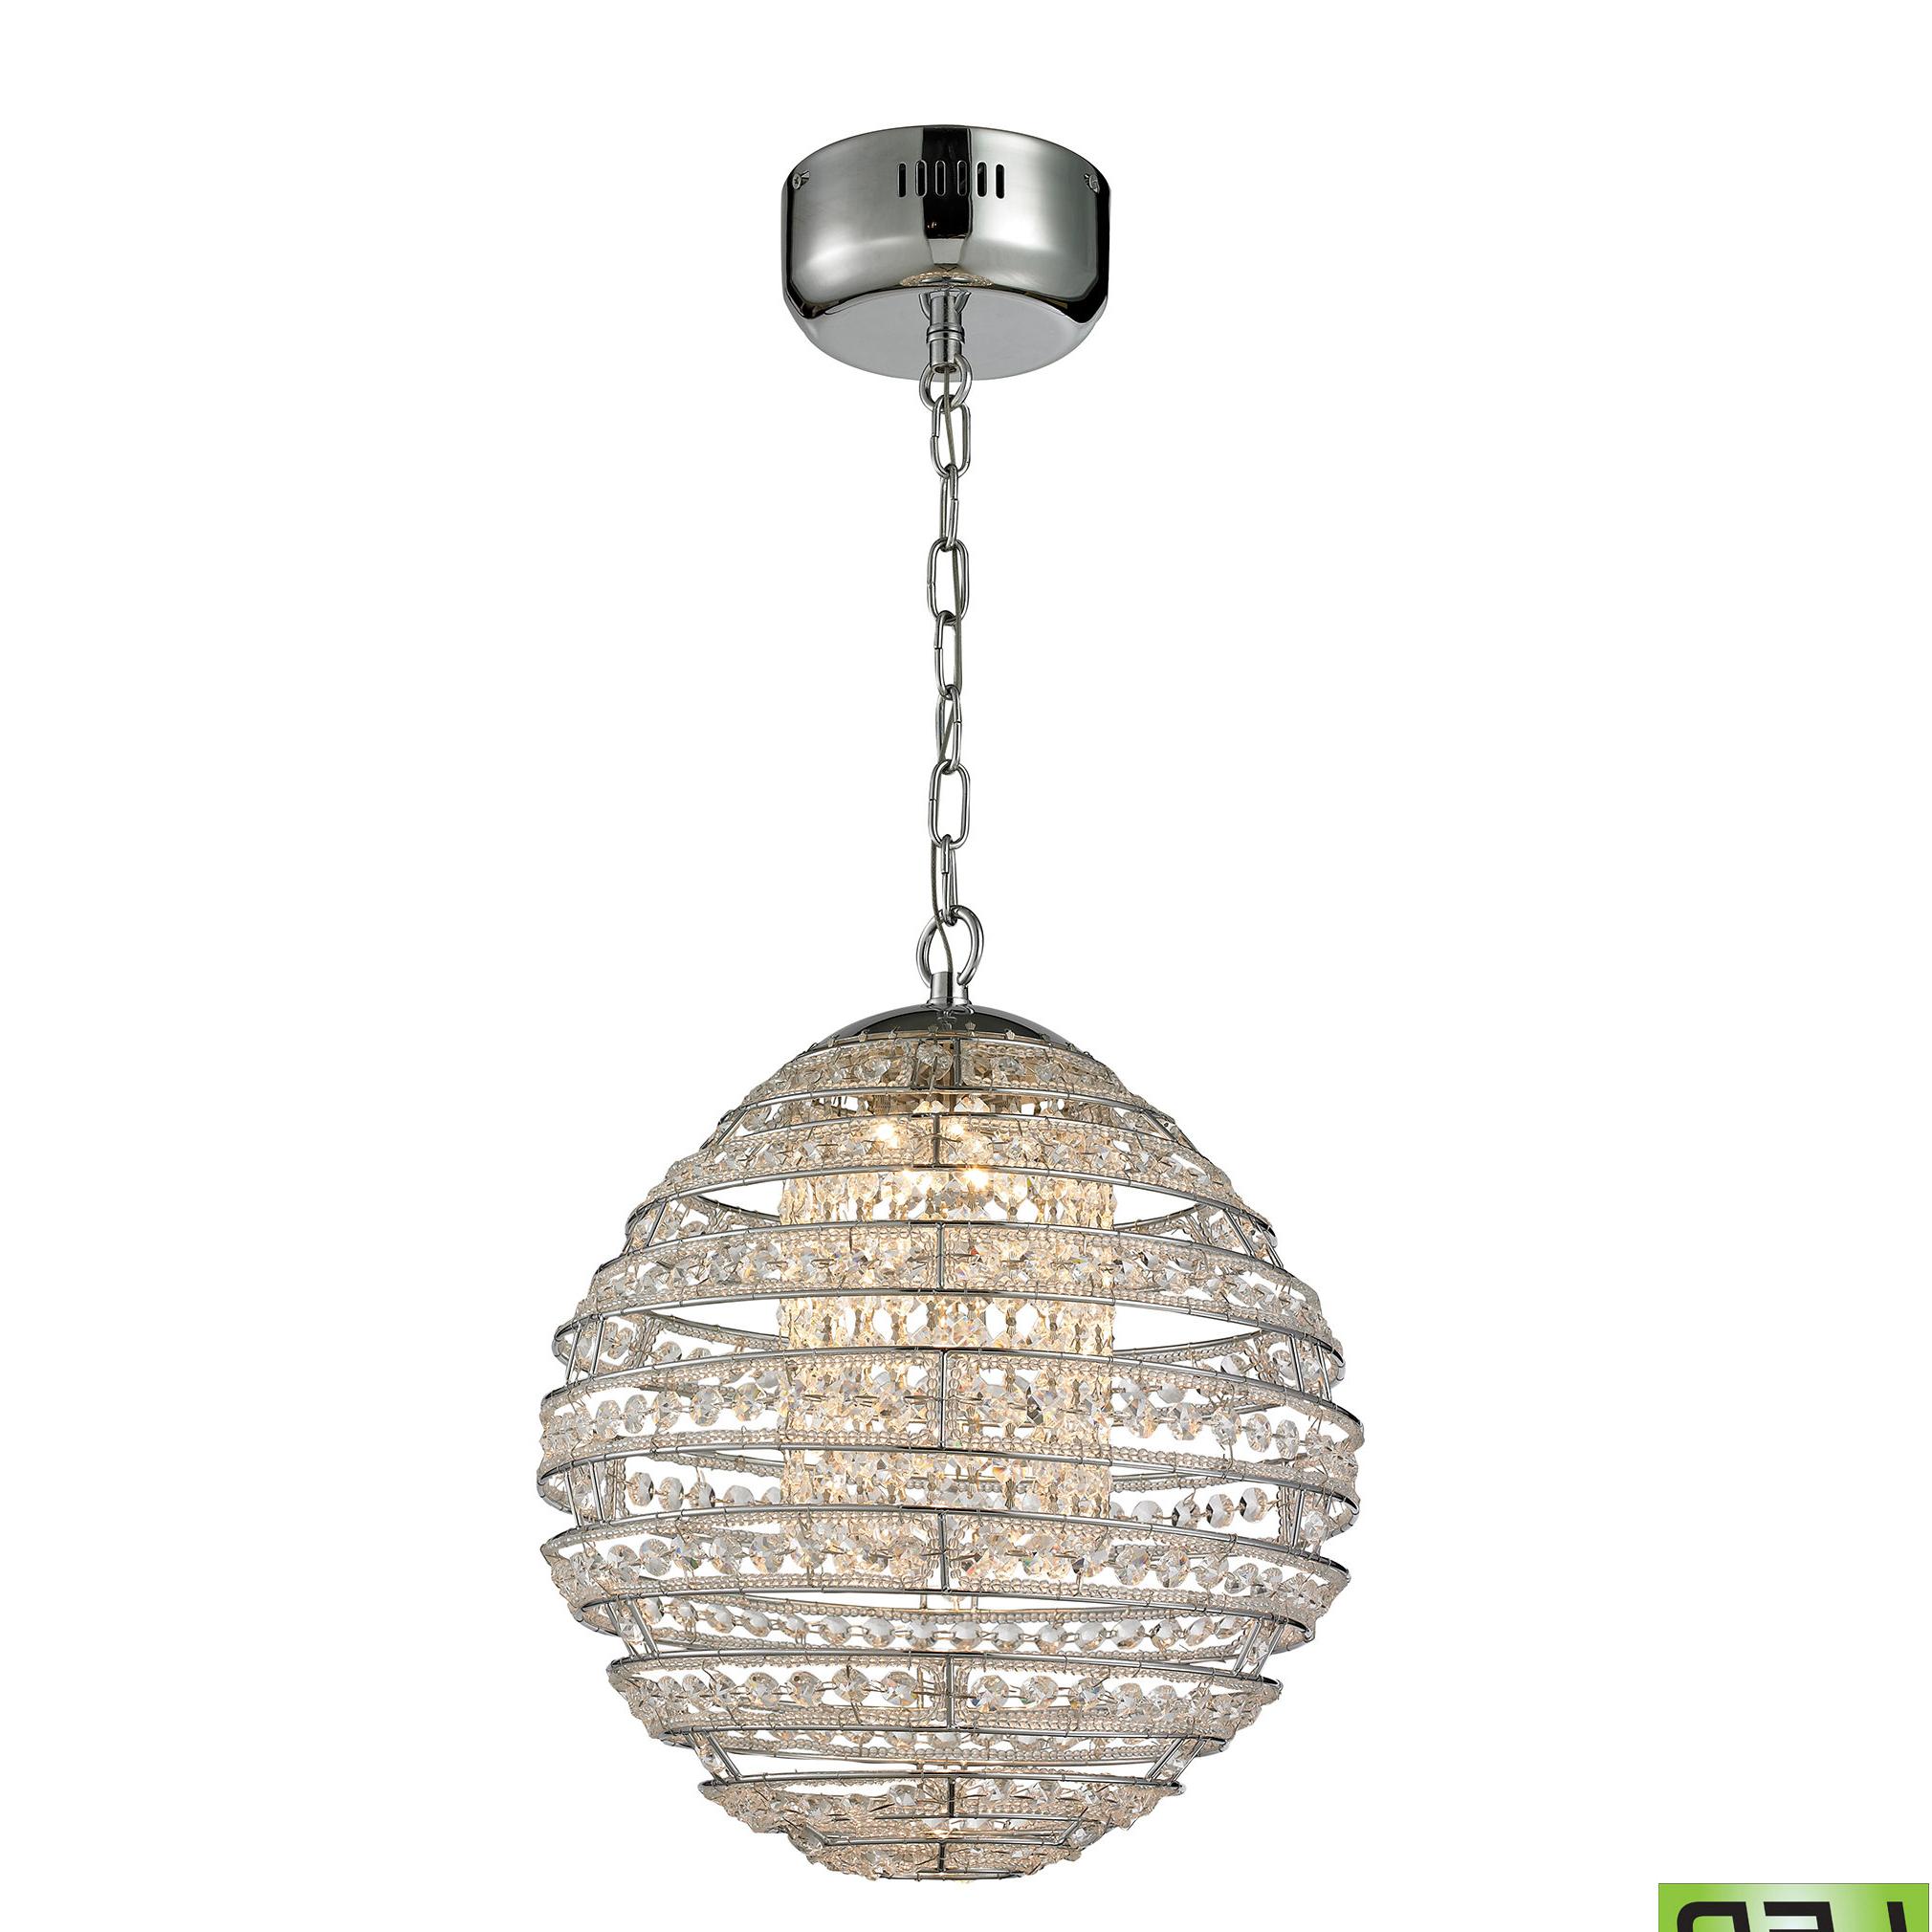 Tussey 1 Light Led Single Globe Pendant For Latest Spokane 1 Light Single Urn Pendants (View 5 of 25)